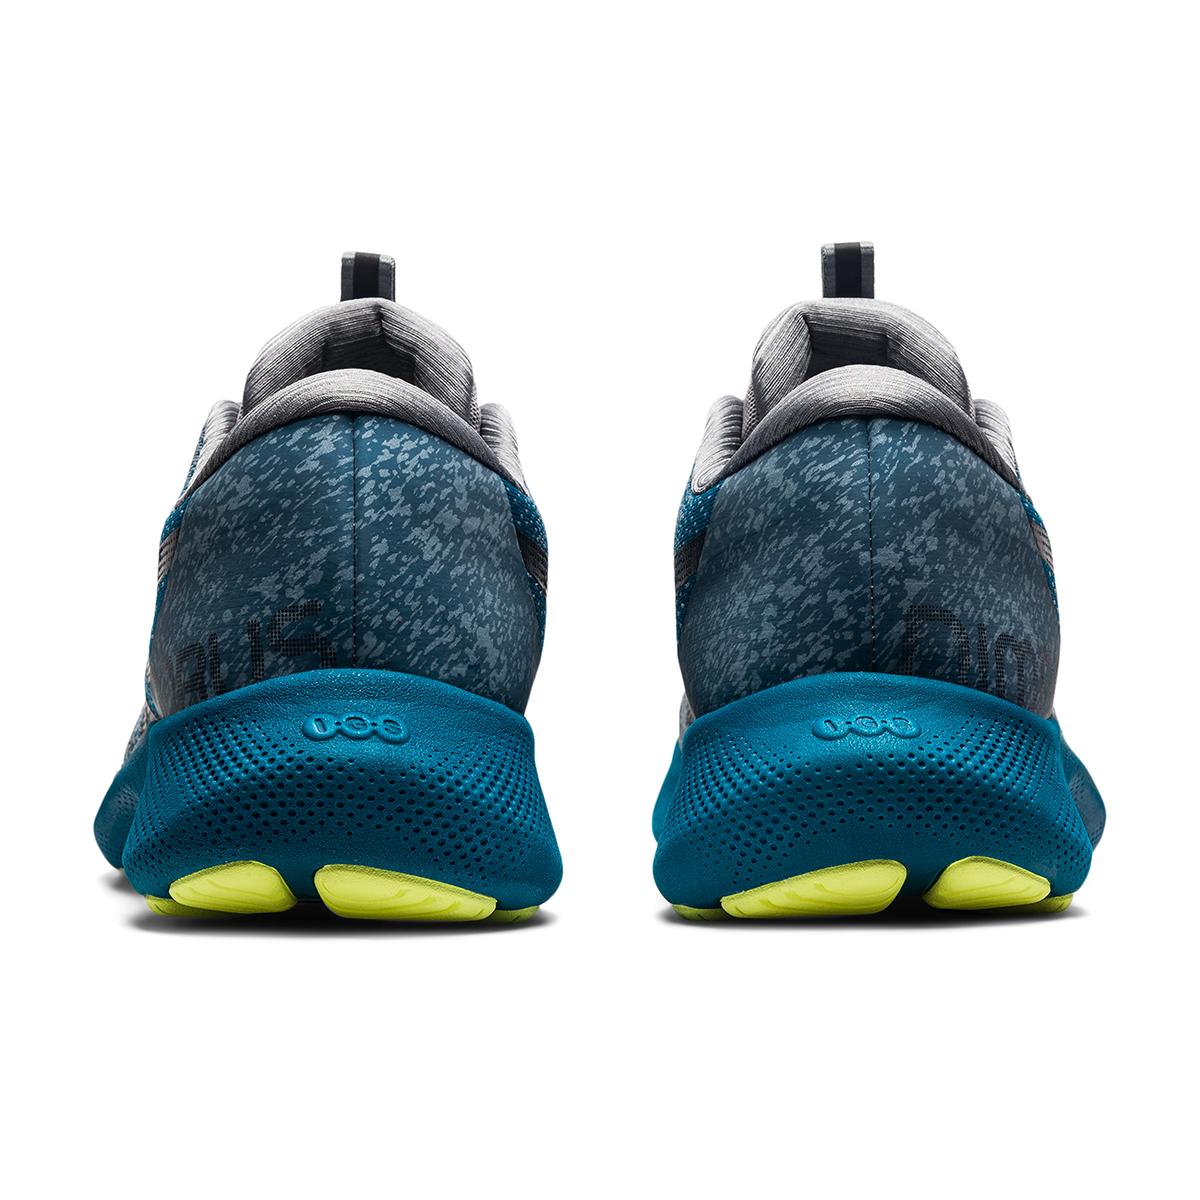 Men's Asics Gel-Nimbus Lite 2 Running Shoe - Color: Deep Sea Teal - Size: 7 - Width: Regular, Deep Sea Teal, large, image 4